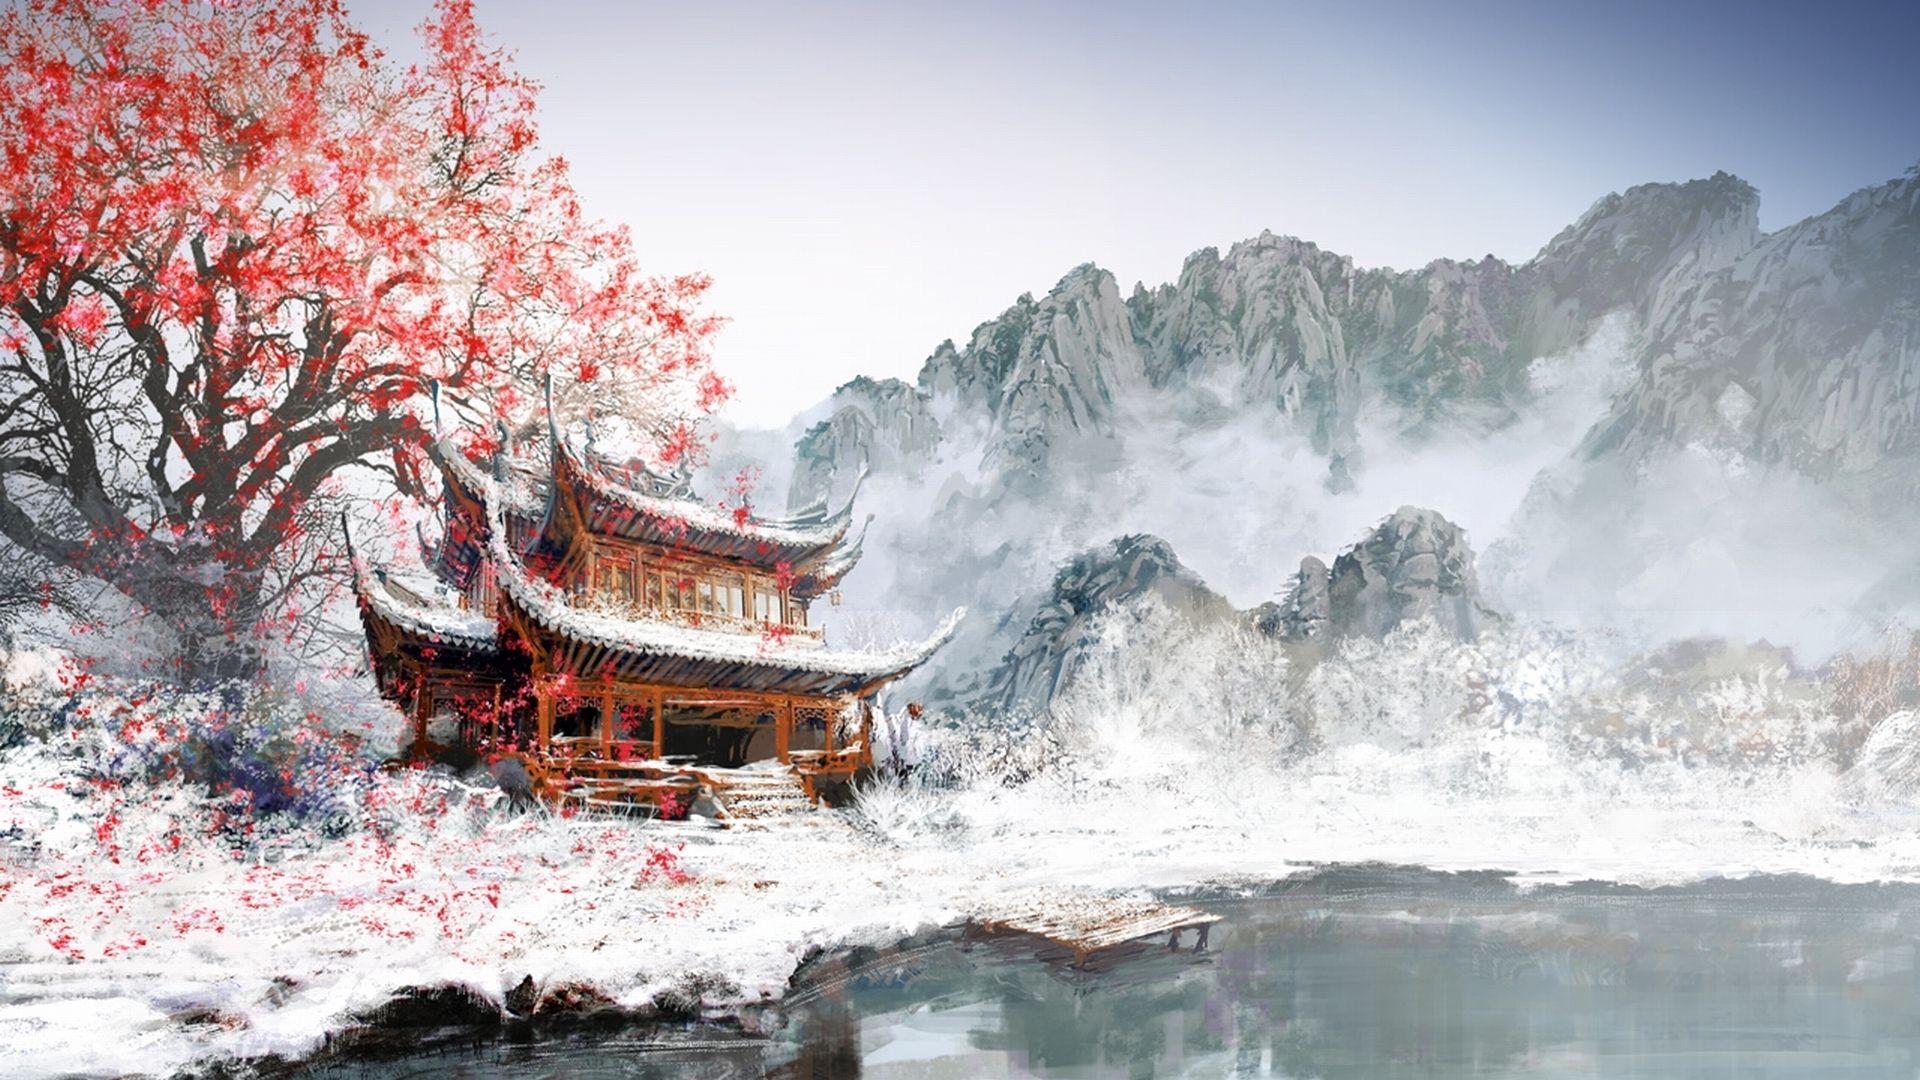 Asian Desktop Wallpapers   Top Asian Desktop Backgrounds 1920x1080